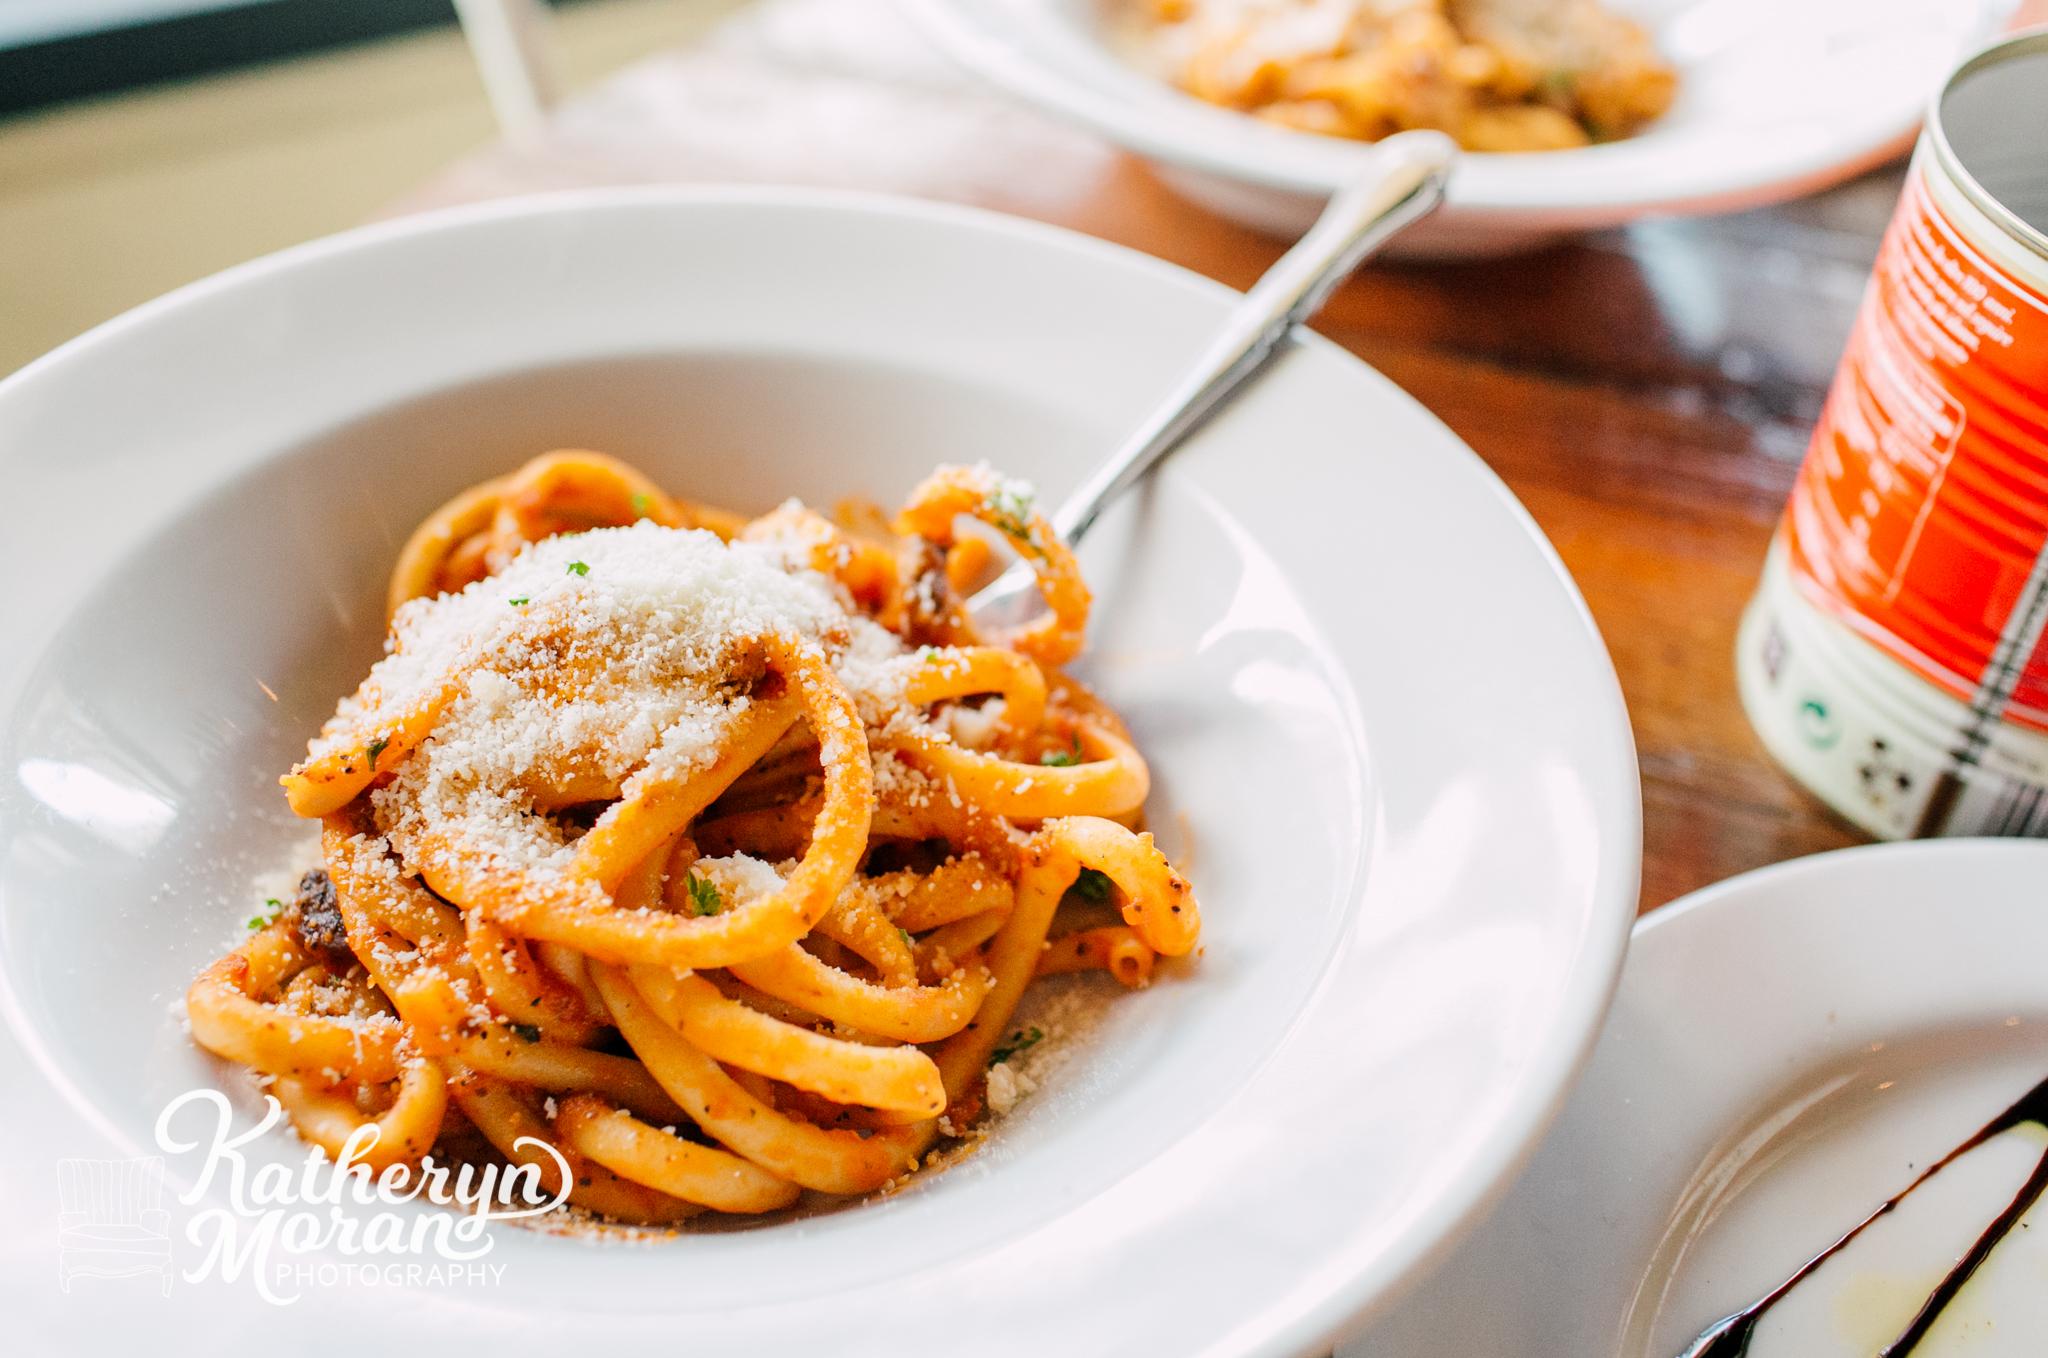 seattle-food-photographer-katheryn-moran-due-cucuina-italiana-2018-18.jpg